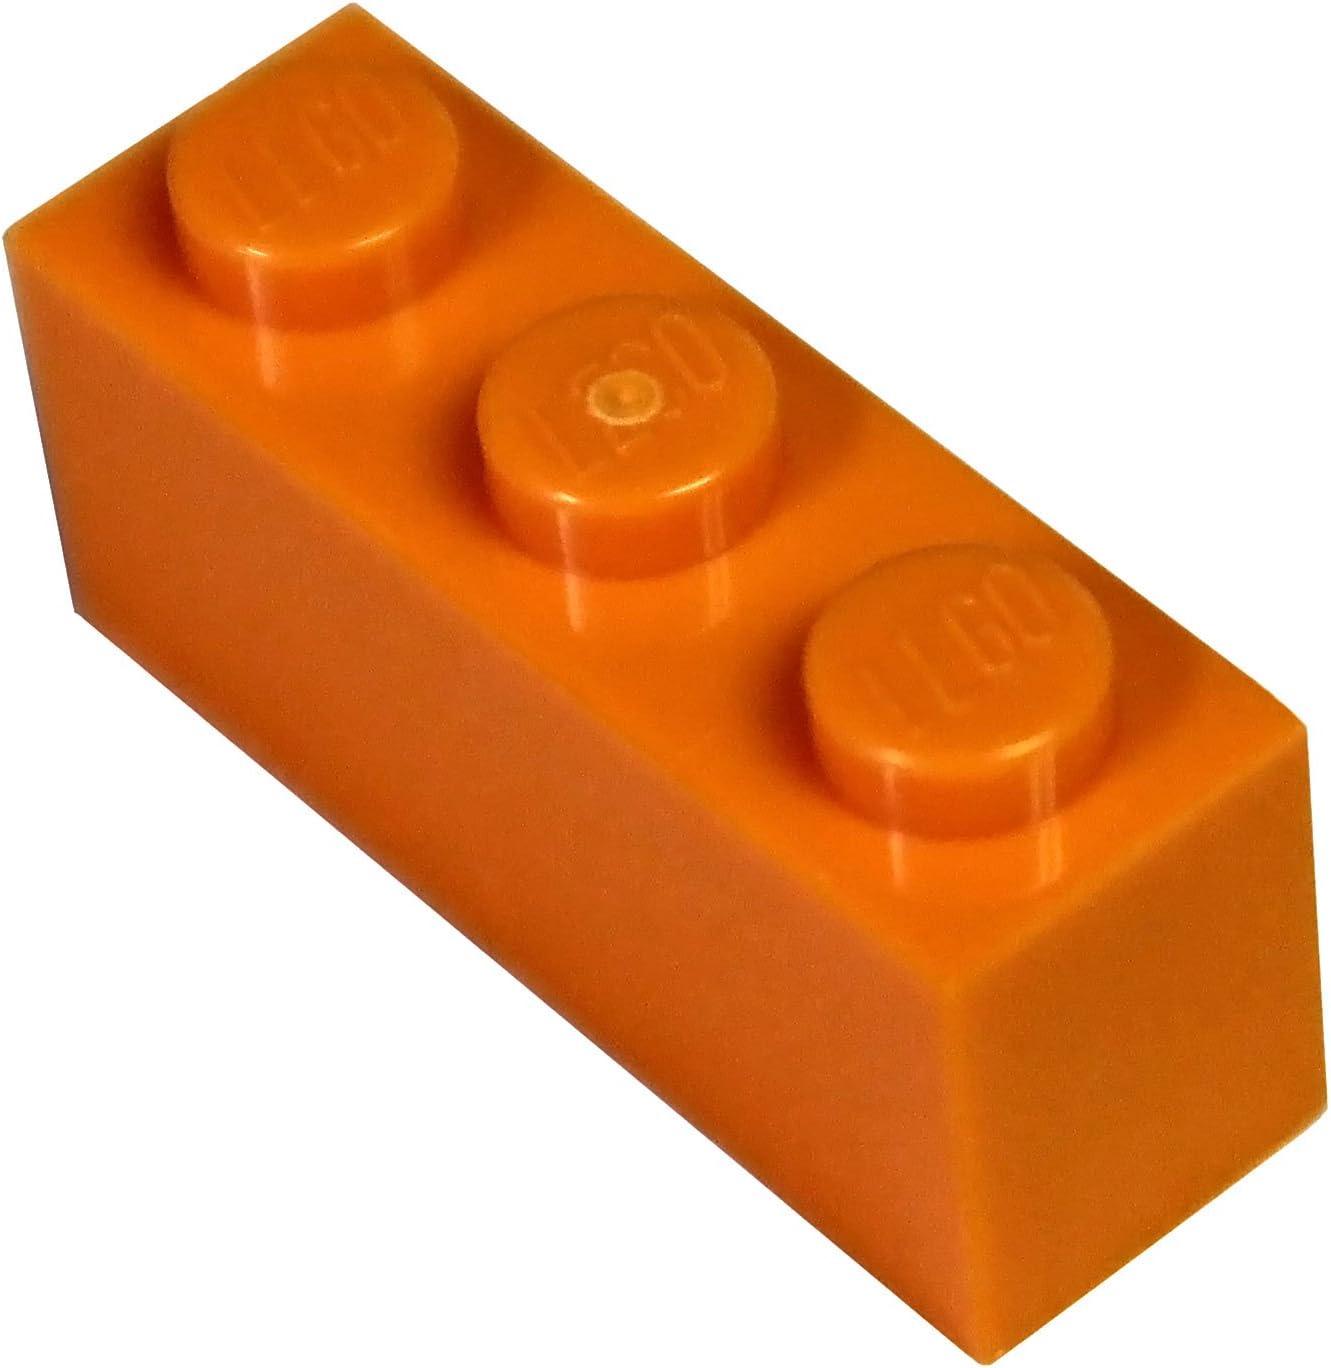 LEGO Parts and Pieces: Orange (Bright Orange) 1x3 Brick x20